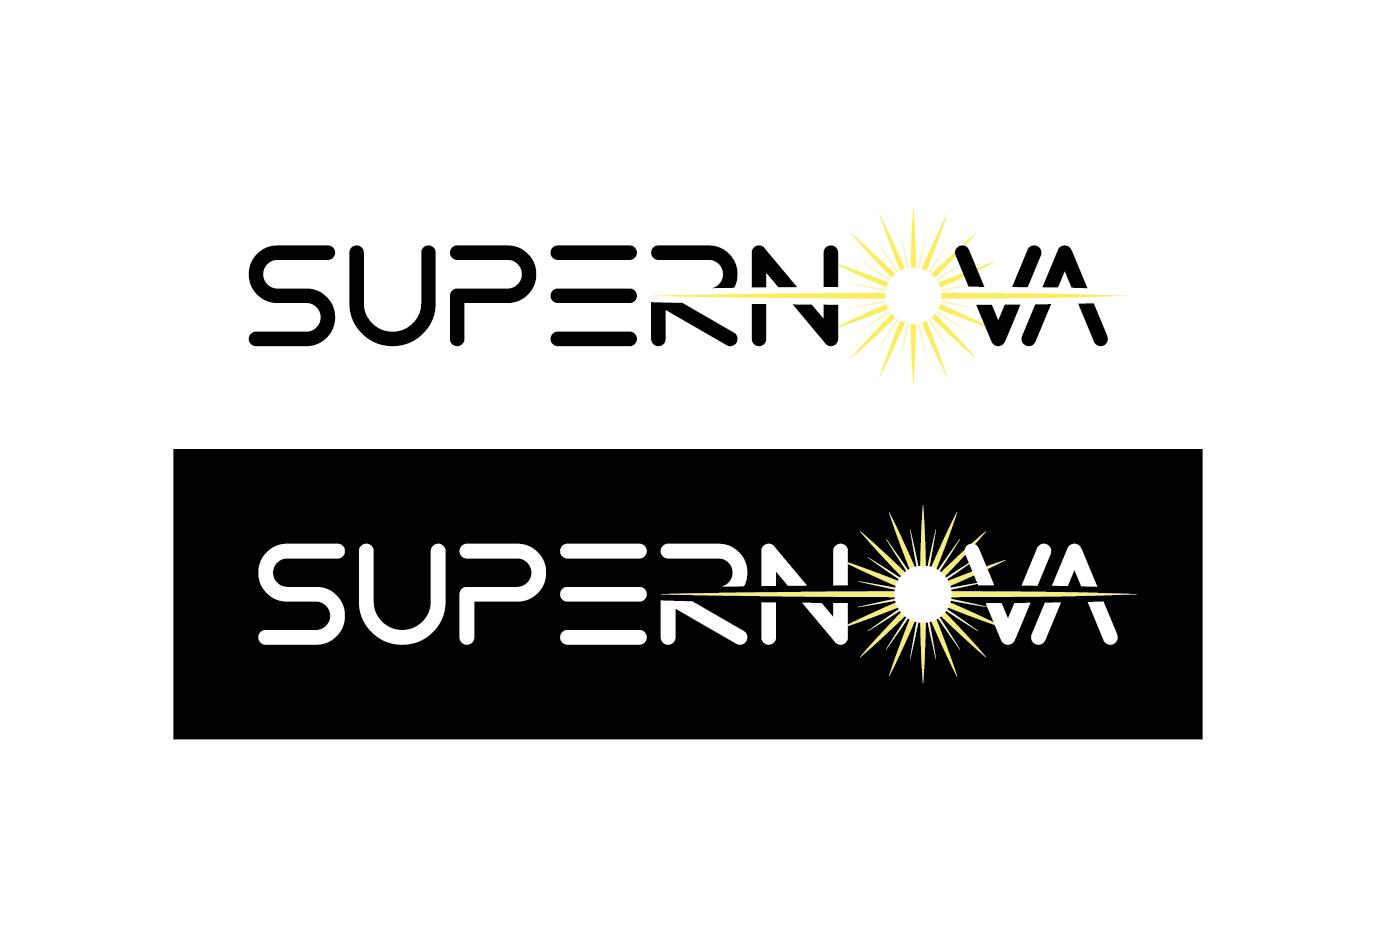 Logo Design by Florian Lagadic - Entry No. 253 in the Logo Design Contest Creative Logo Design for Supernova.